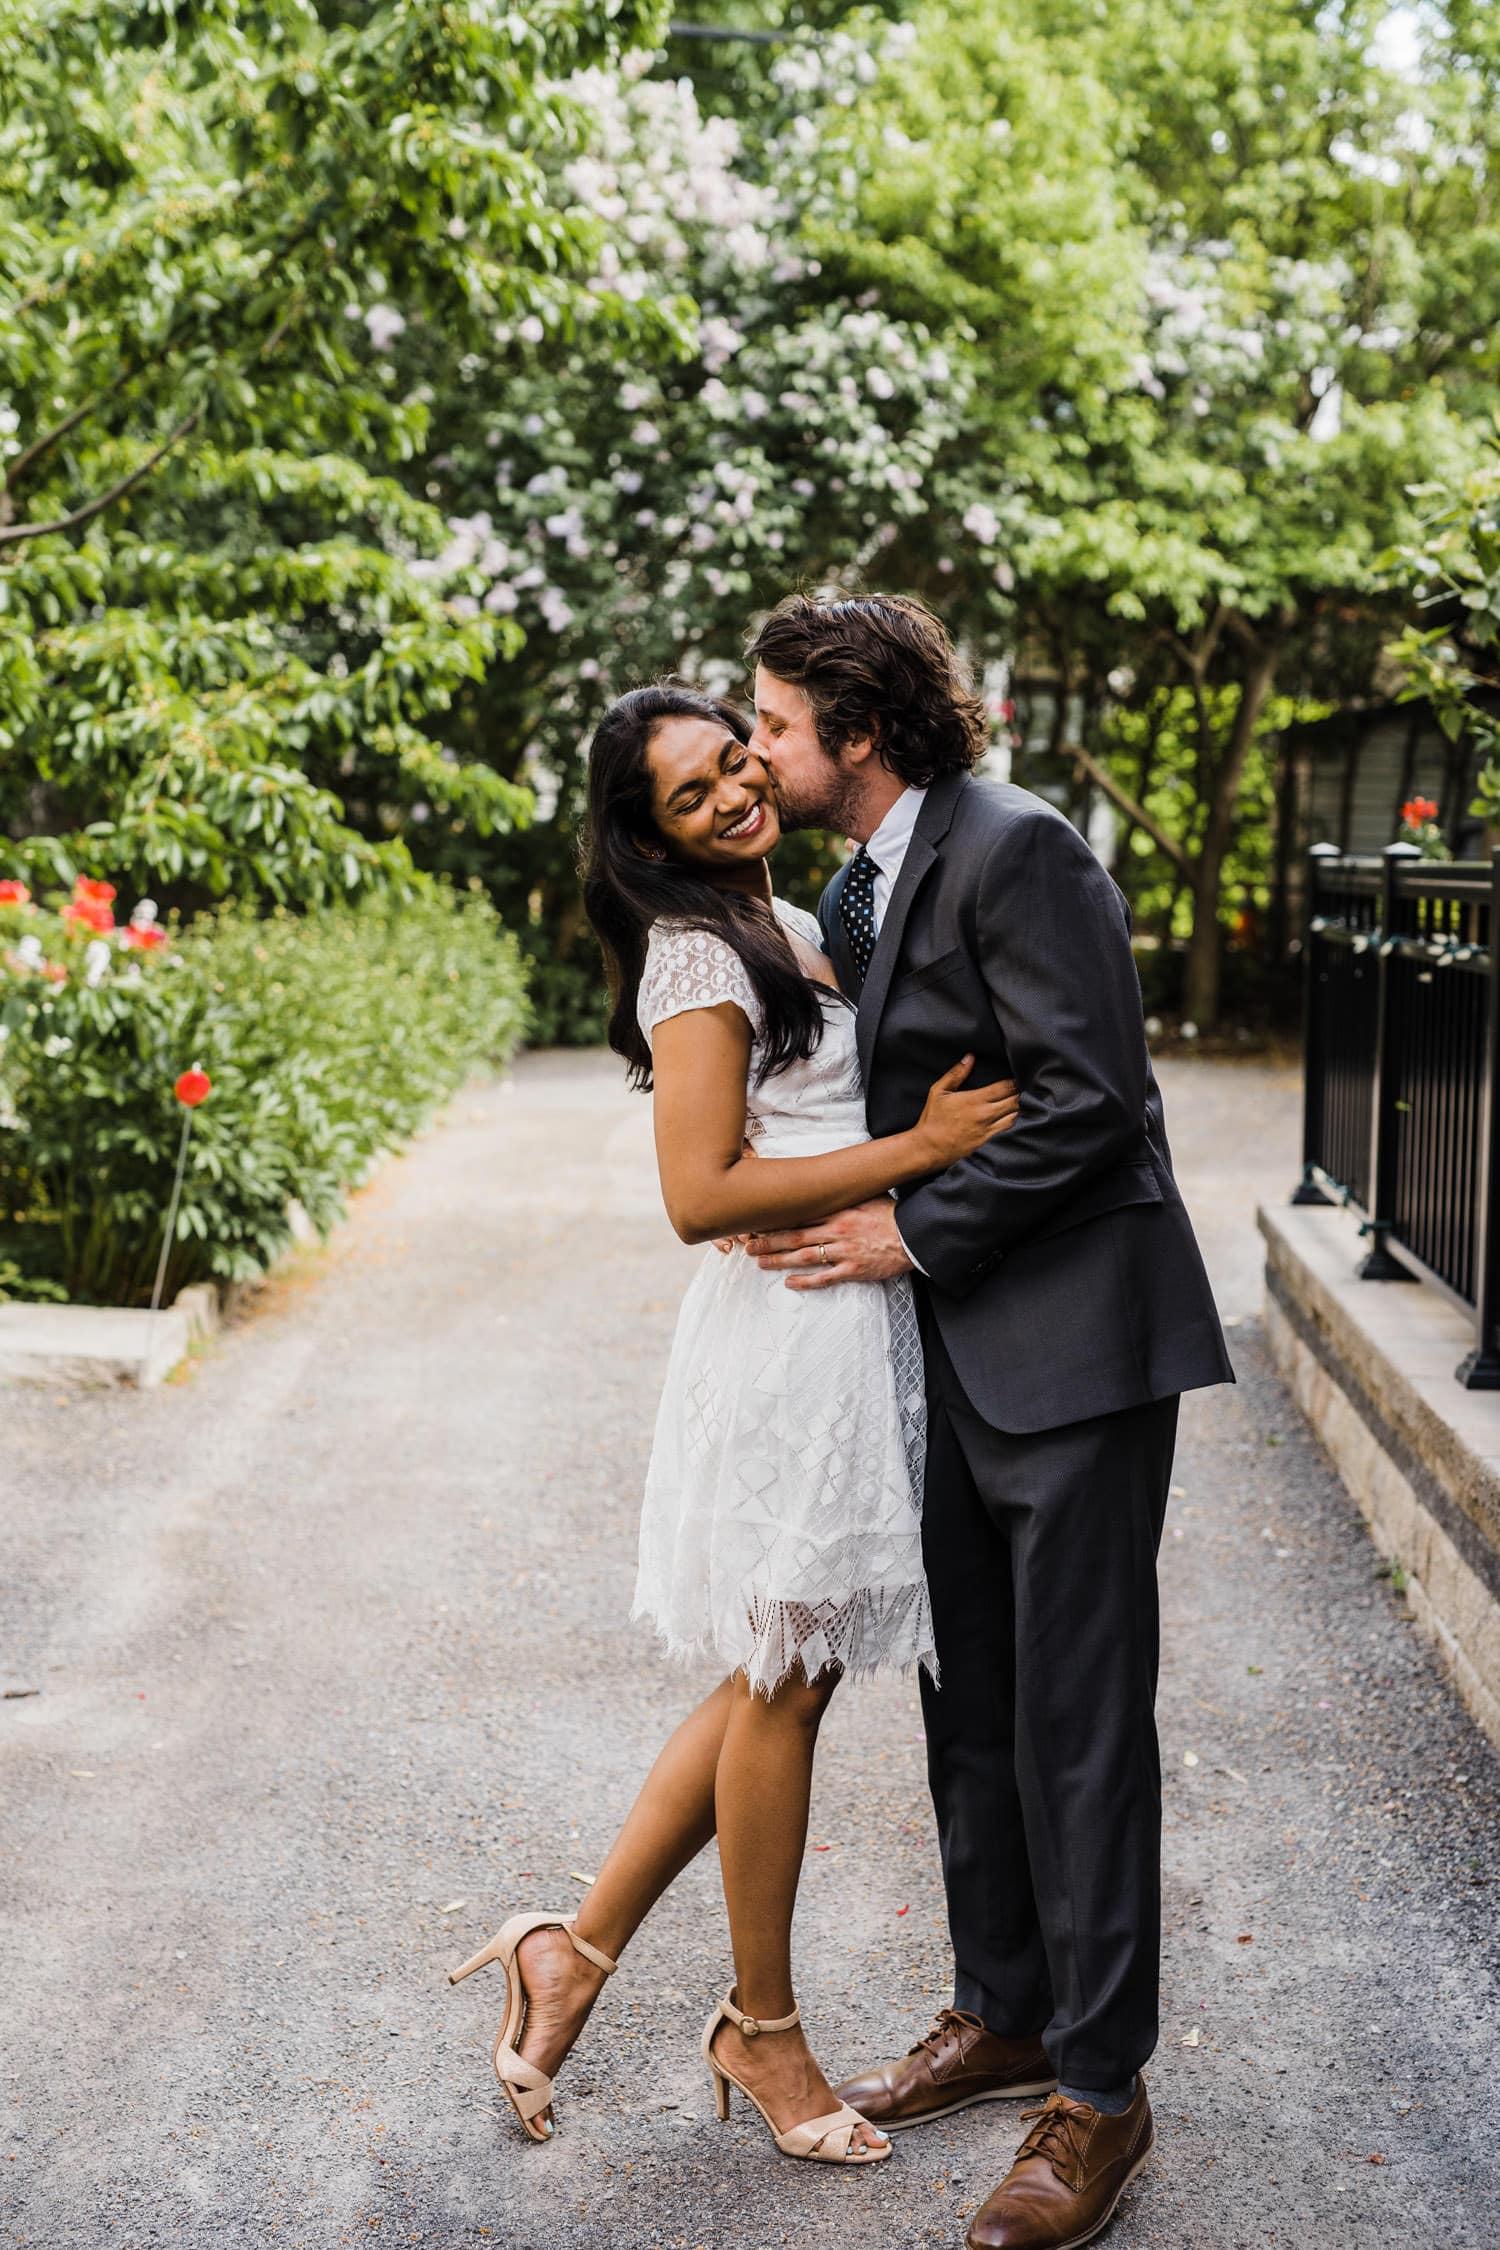 groom kisses brides cheek - small backyard ceremony ottawa